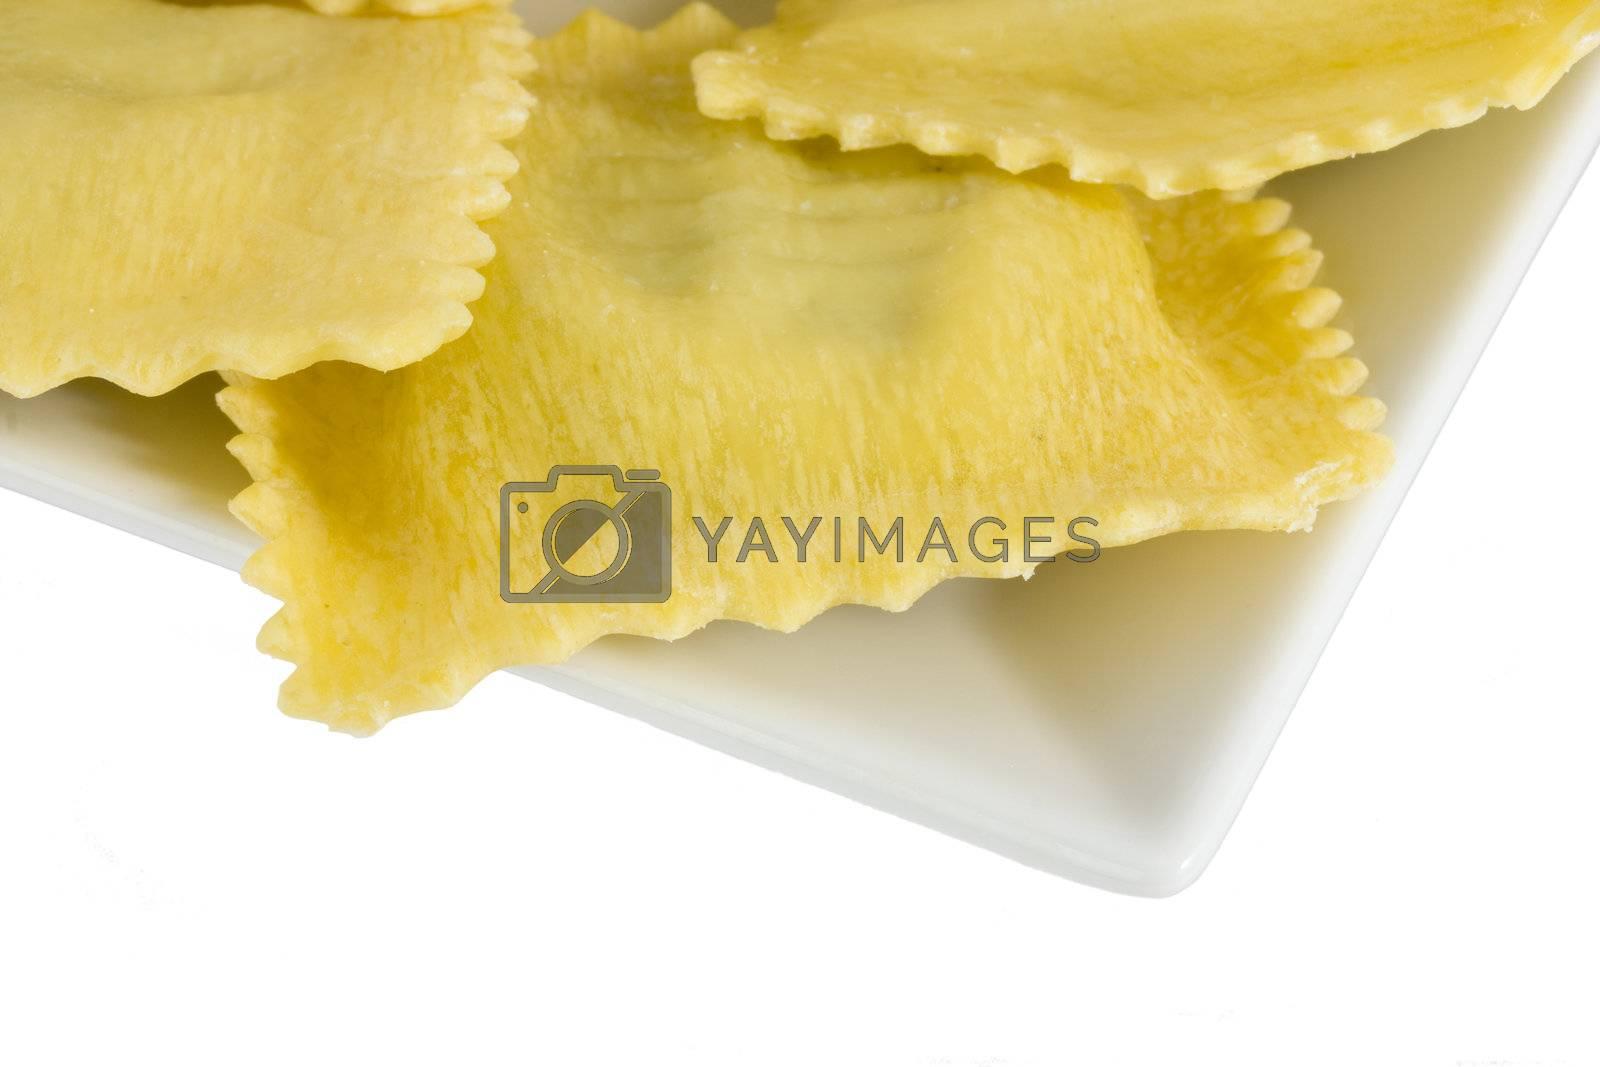 home made ravioli pasta on a angled plate